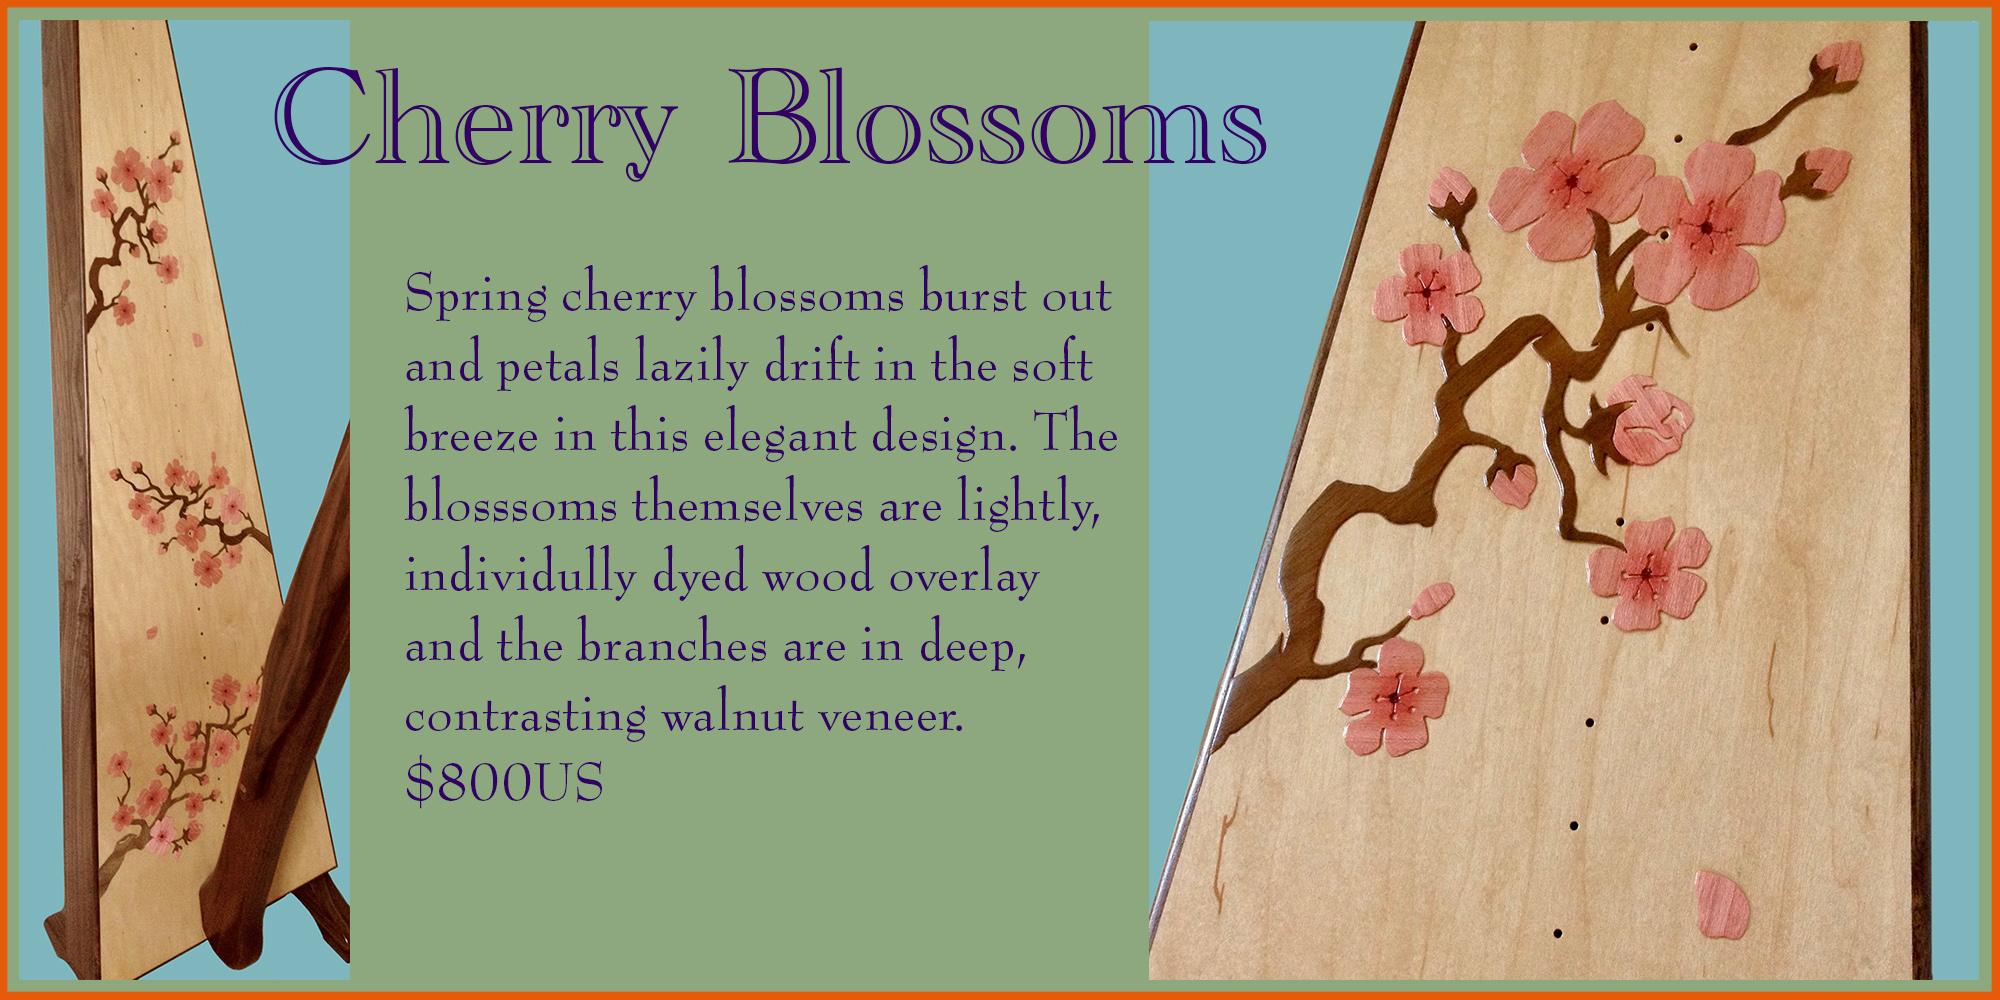 Cherry Blossom Orn Panel.jpg